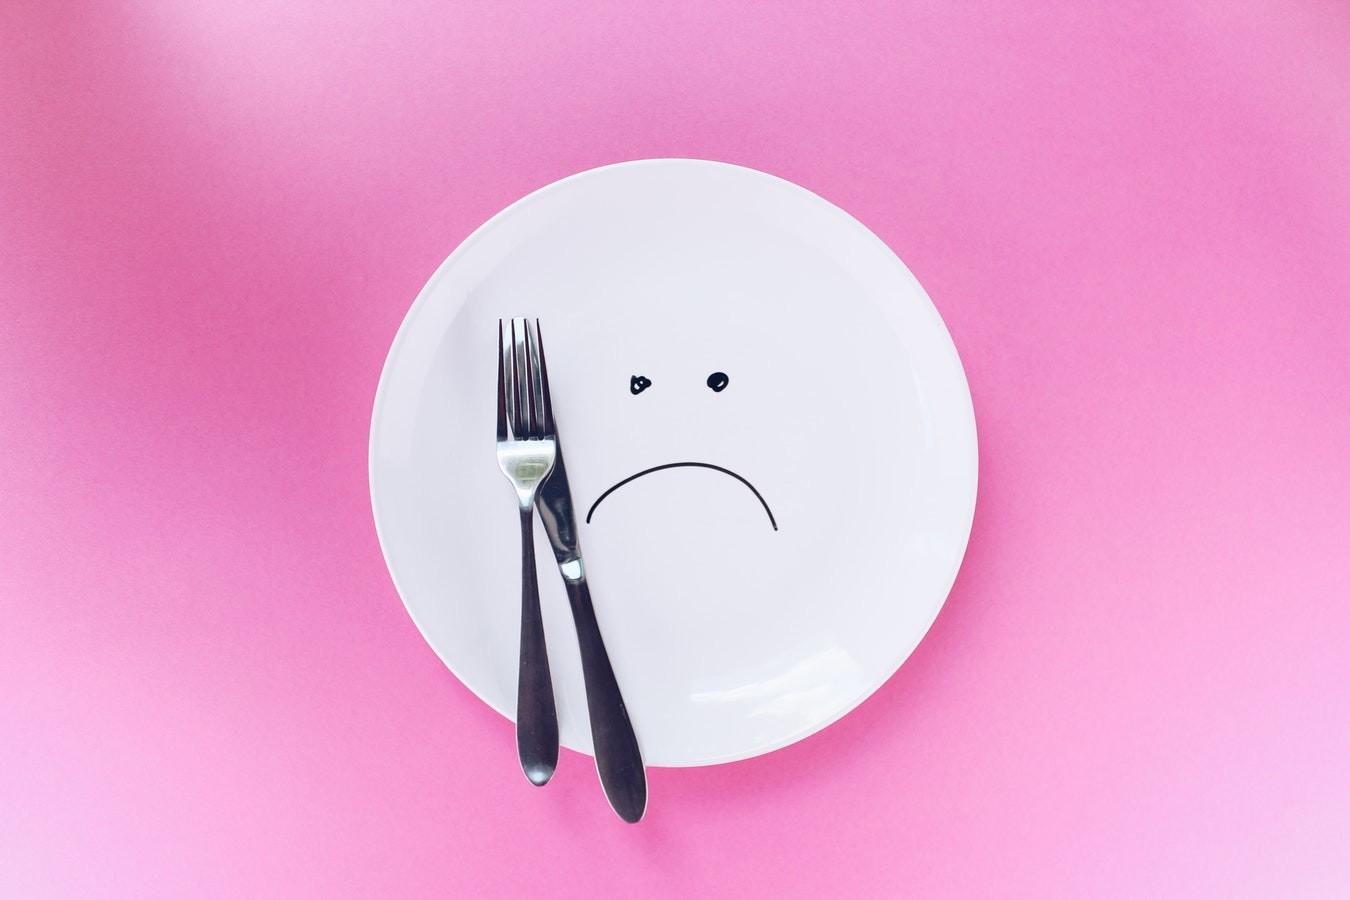 vitonica dieta adelgazar 31 minutos